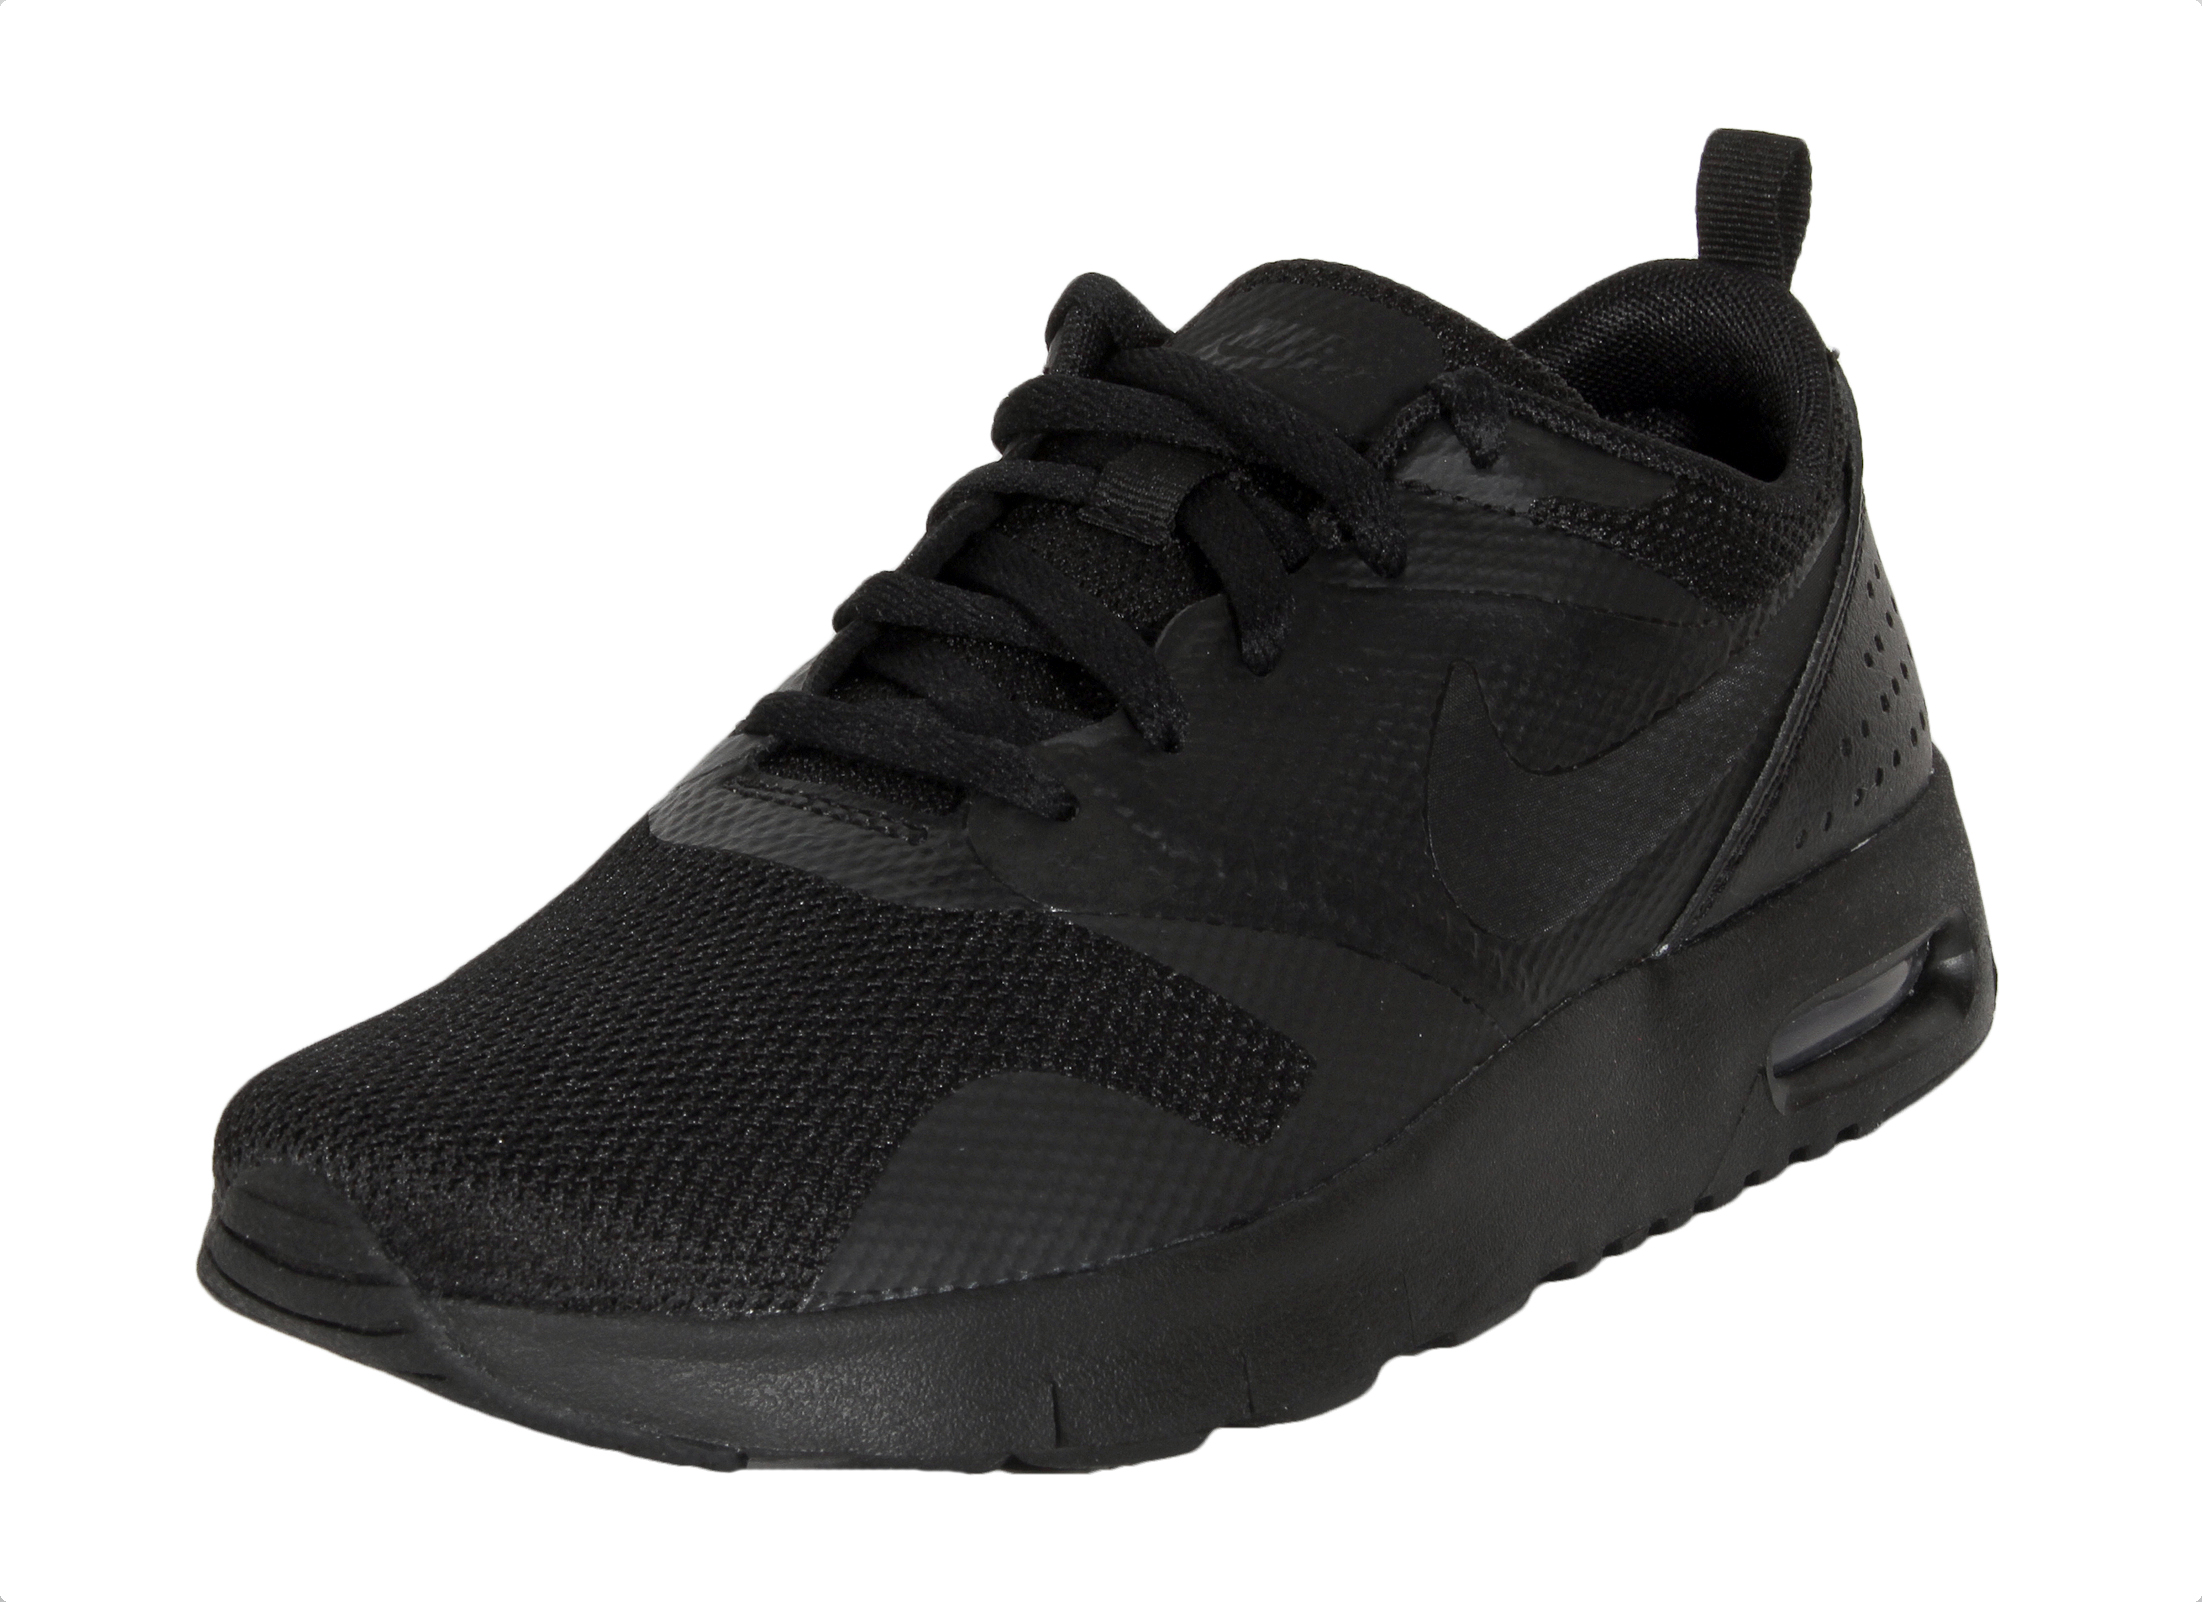 on sale 3e9bb 05073 Nike Air Max Tavas Boys  Preschool Black black 44104005 1   eBay